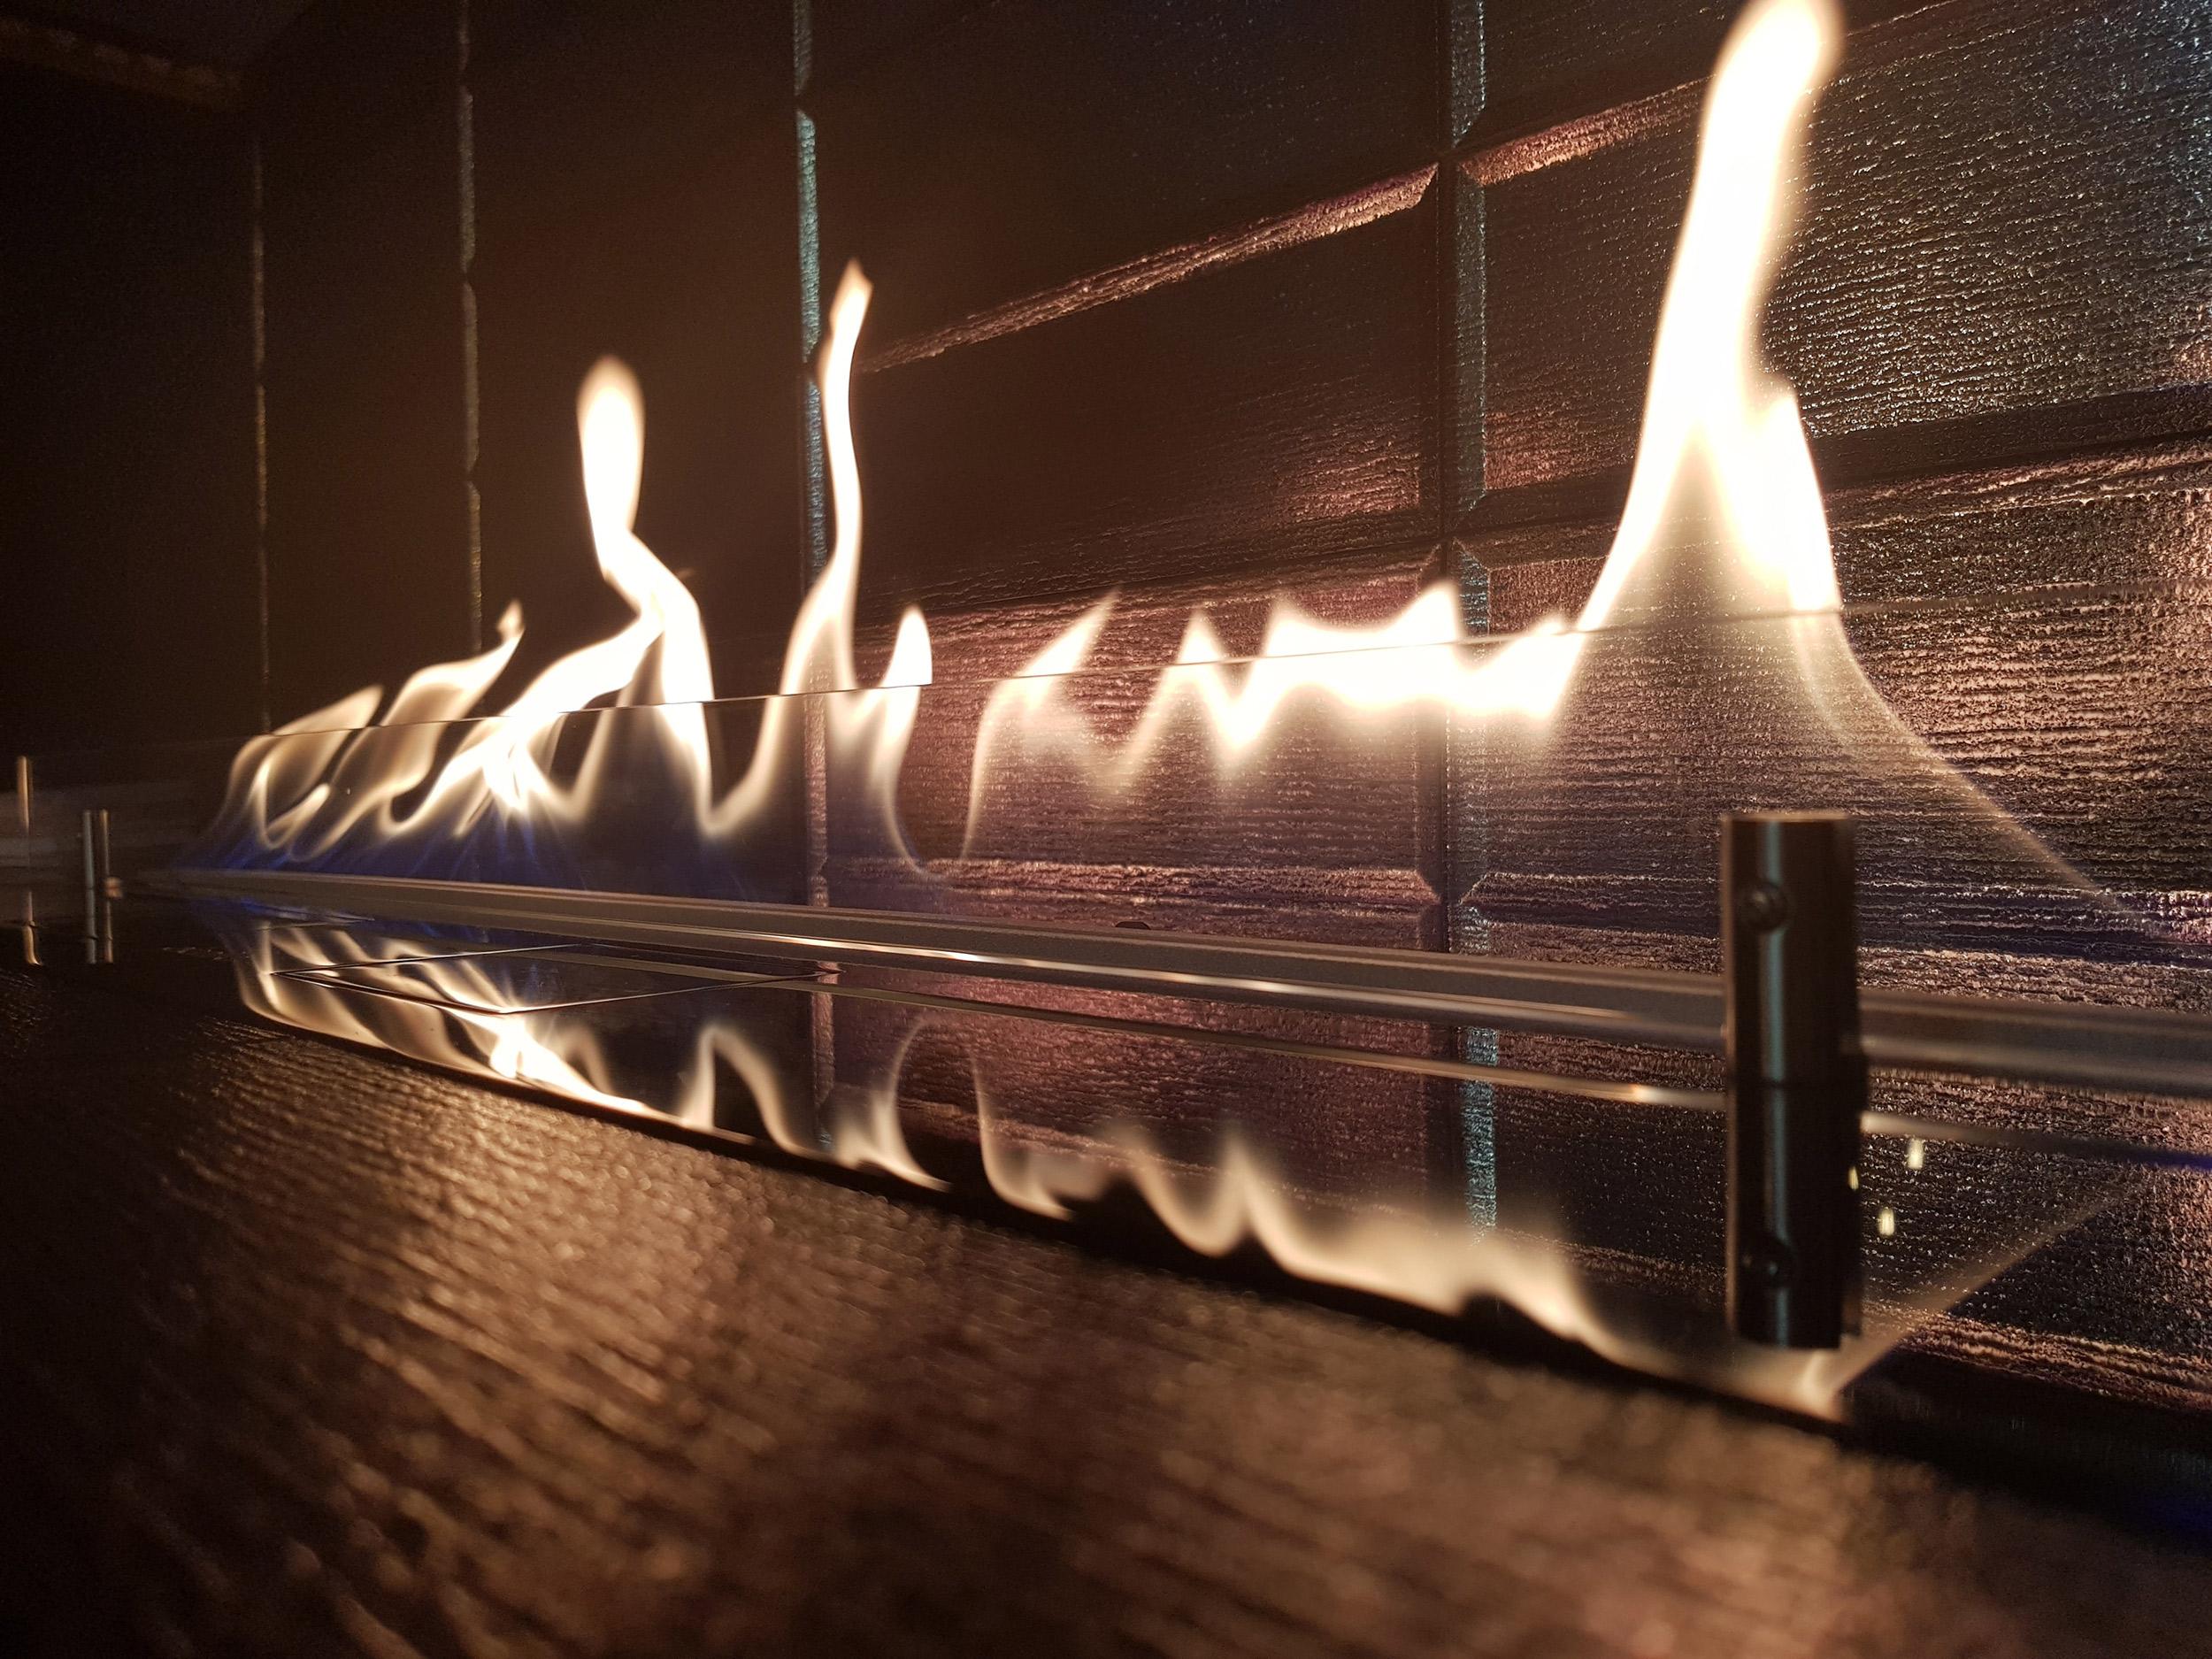 FLA3-in-Casing-C-Planika-Ember-Fireplaces-showroom-Edison-NJ-USA.jpg